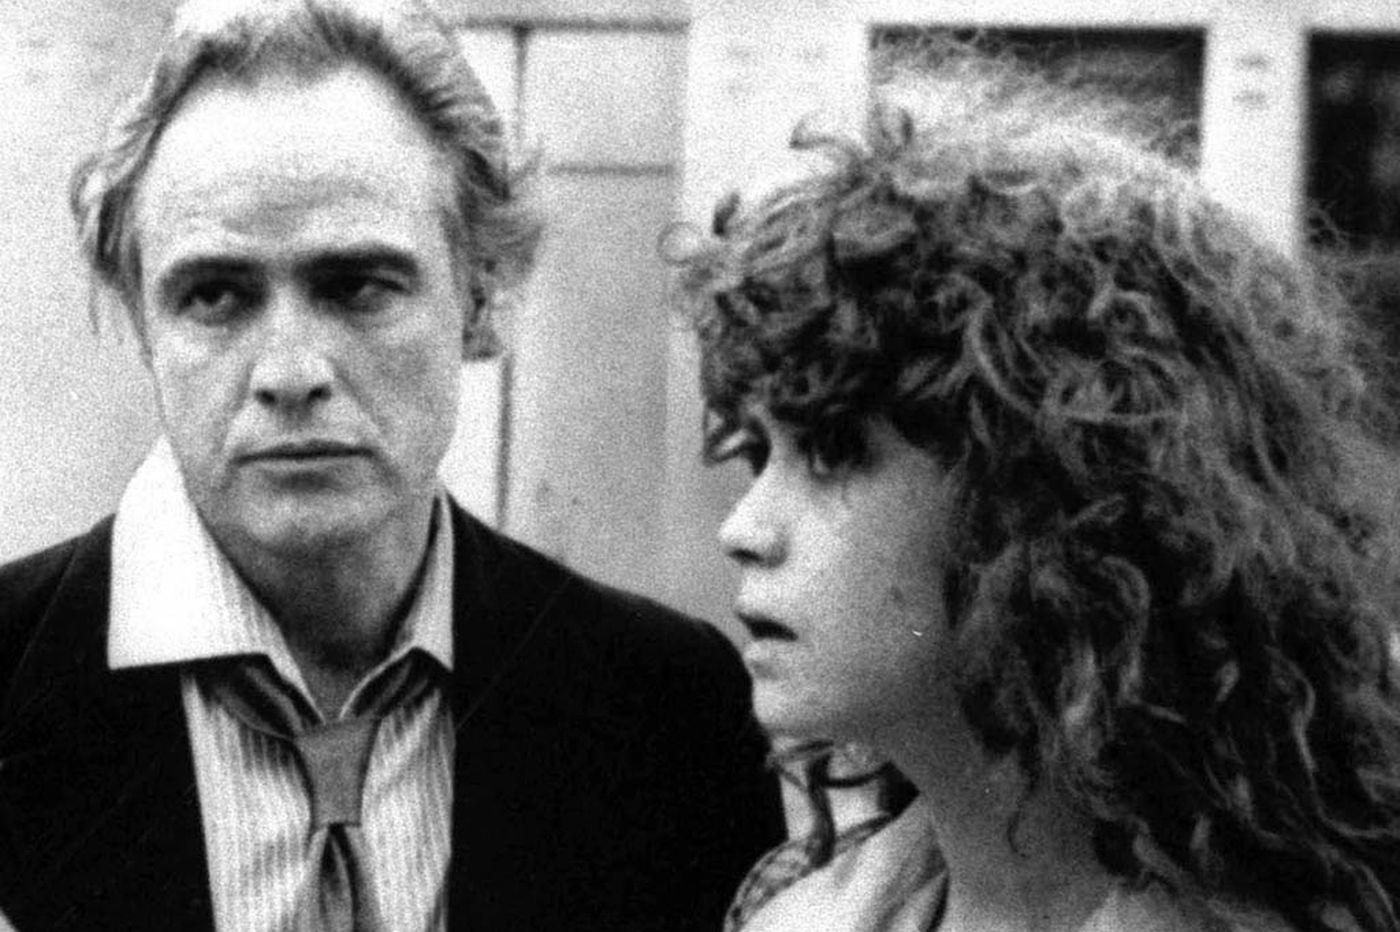 NPR and 'Fresh Air' cut ties with film critic David Edelstein over 'Last Tango in Paris' rape joke